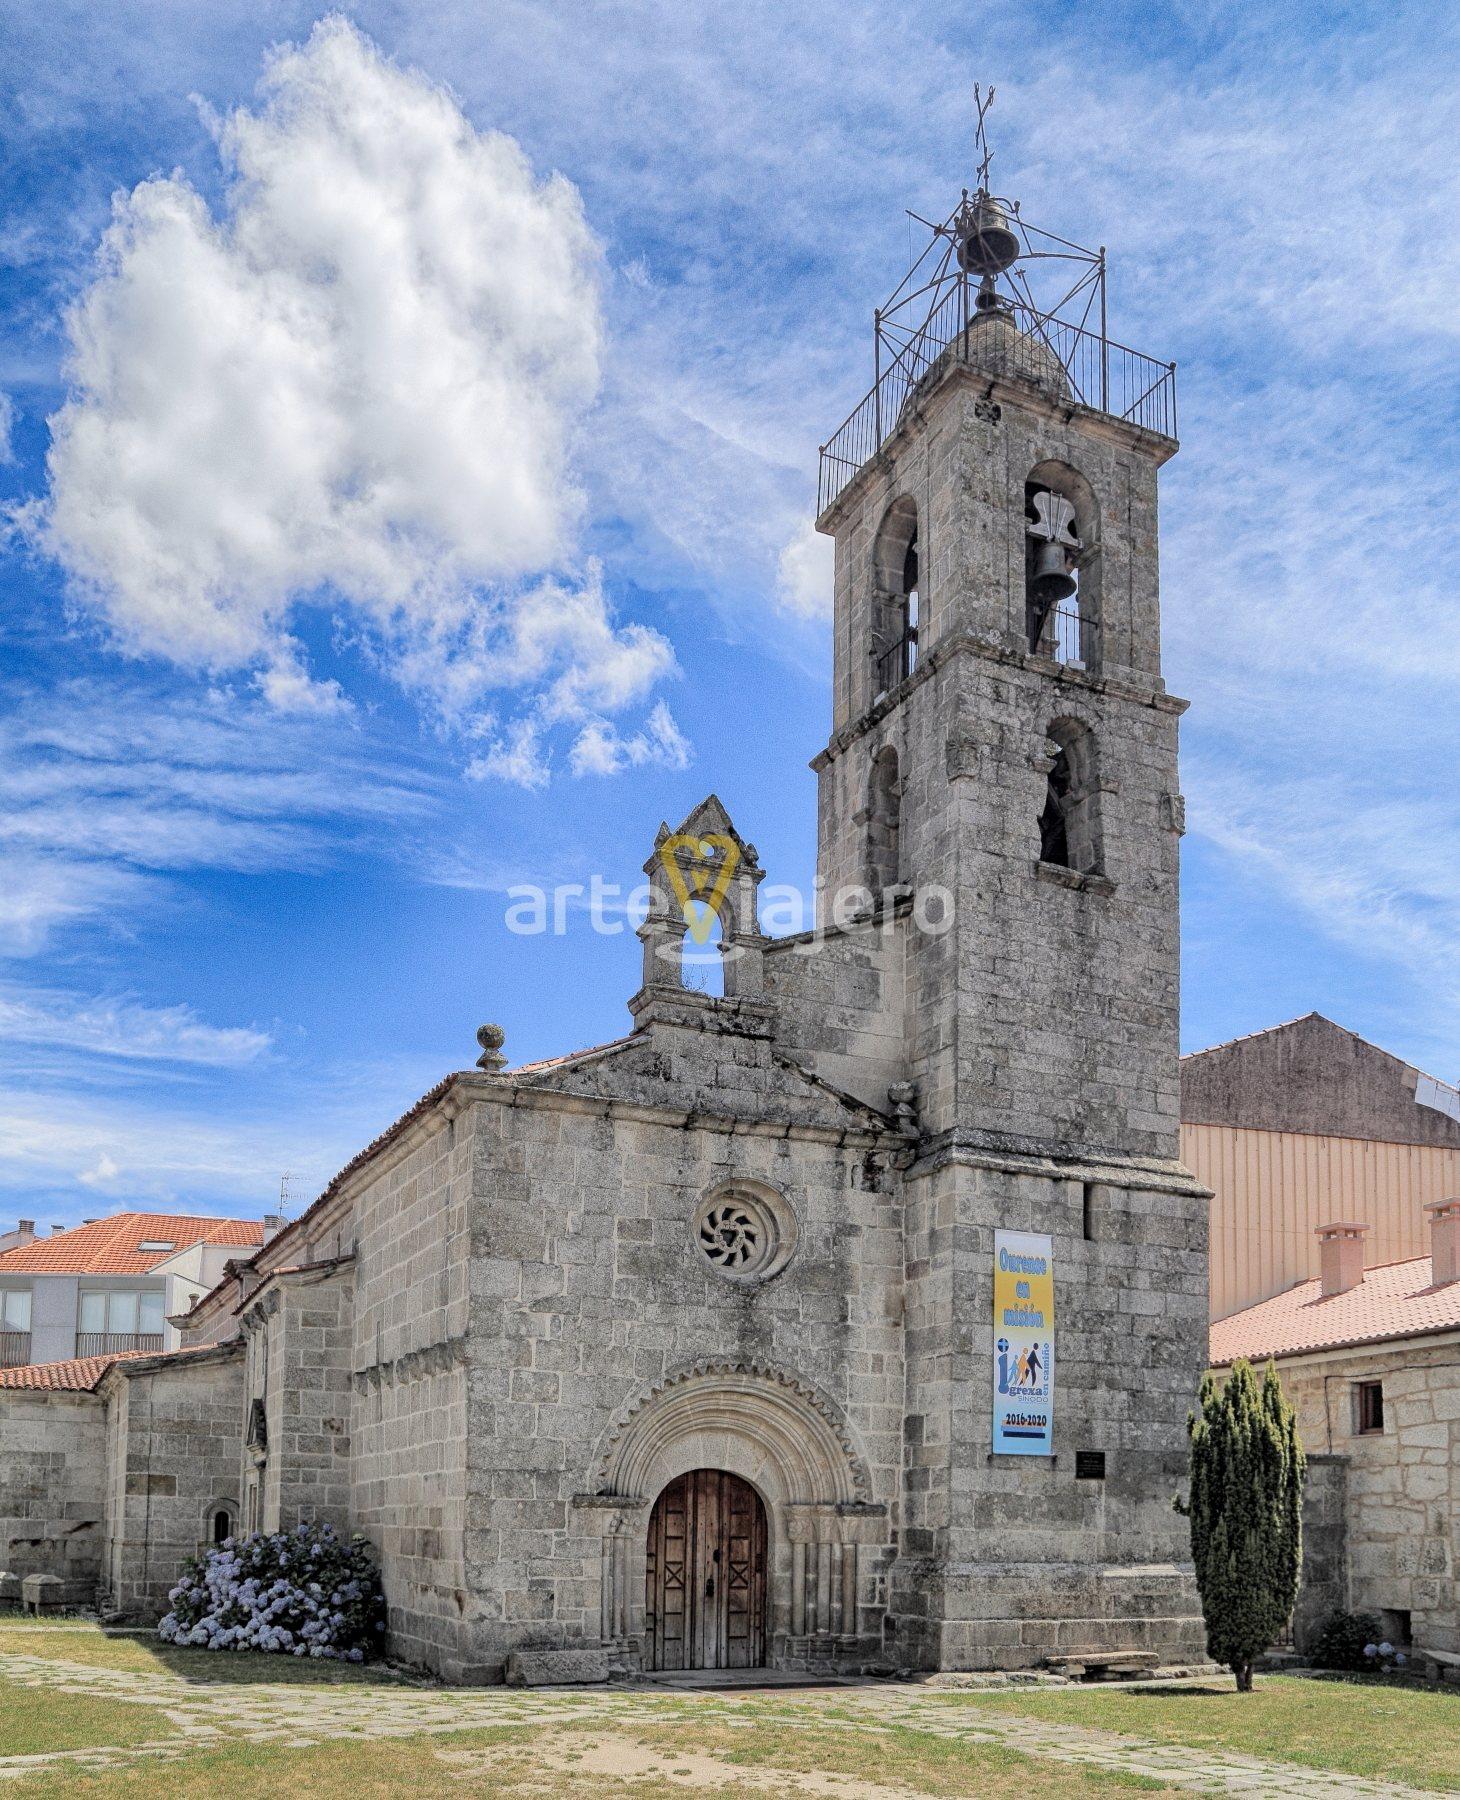 iglesia de xinzo de limia